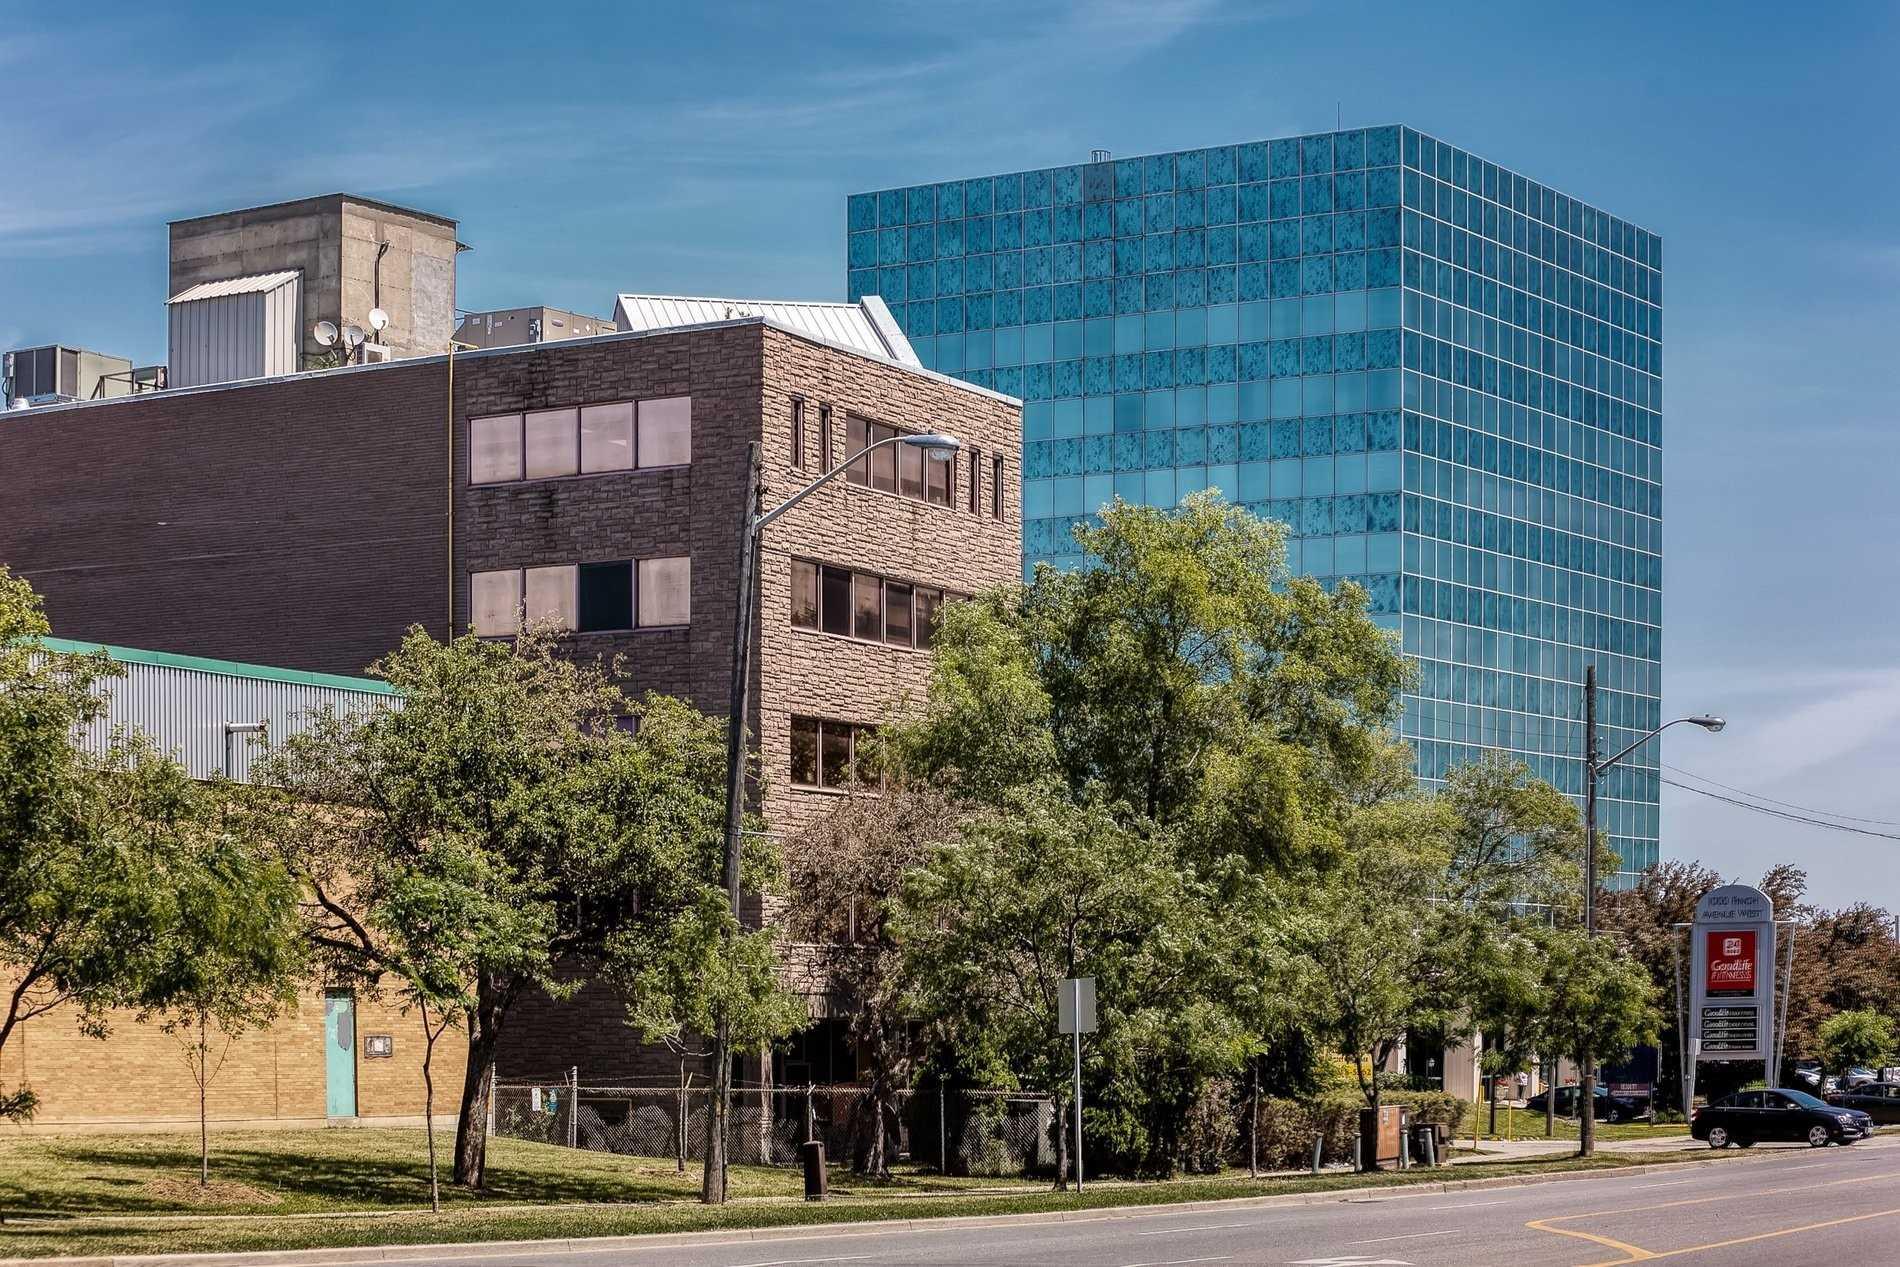 1018 Finch Ave W, Toronto, Ontario (ID W5279232)